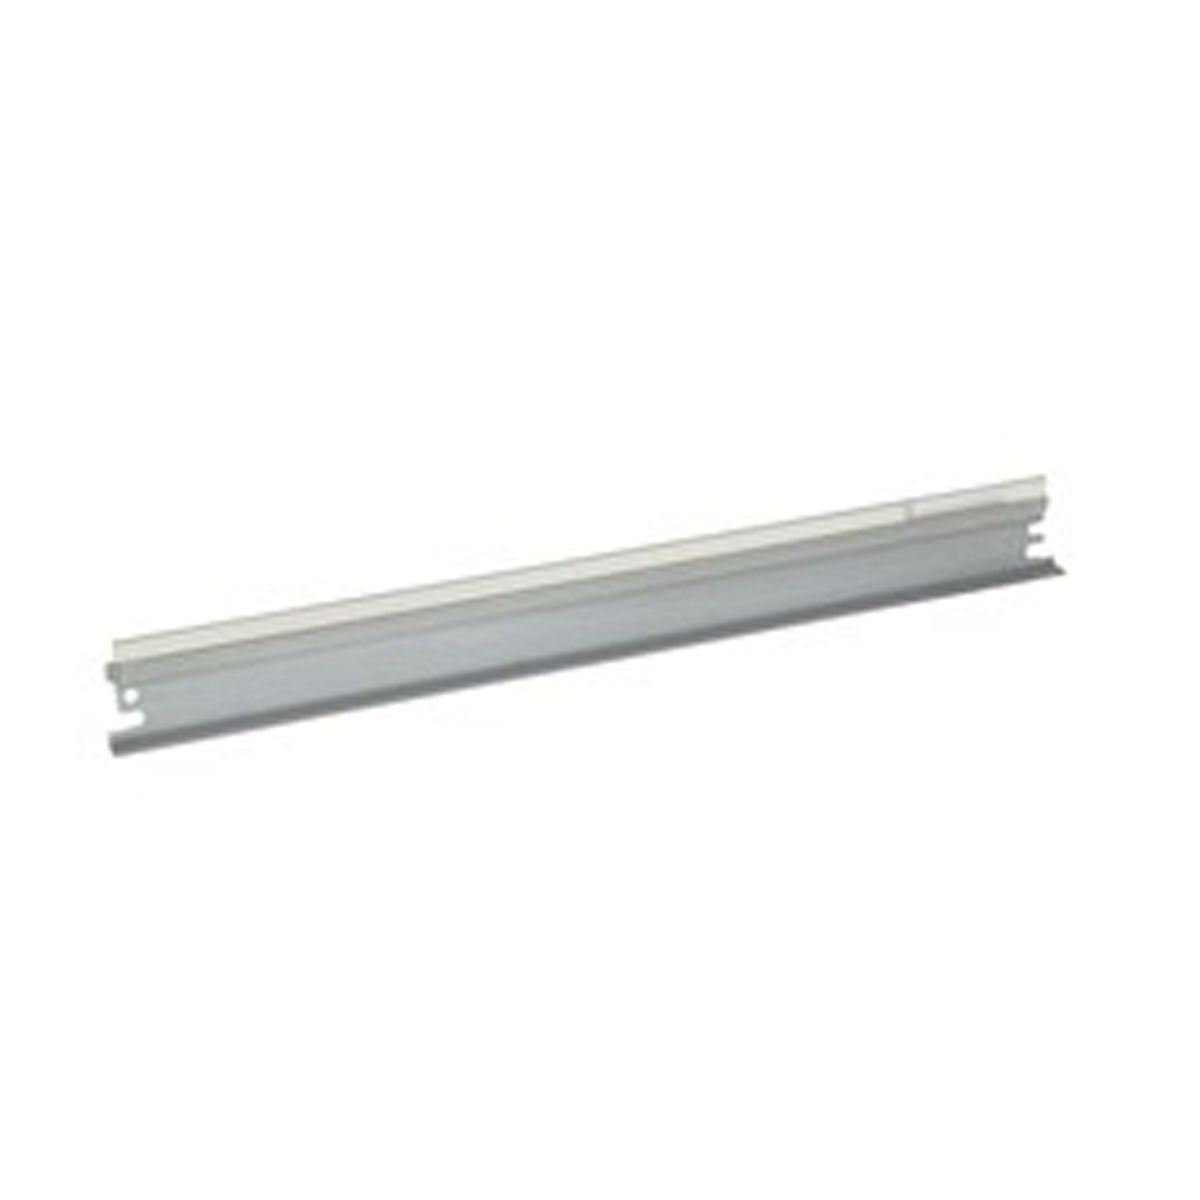 Lamina Limpeza Wiper Blade Samsung D101S D101 101 - ML2160 - ML2165 - SCX3400 SCX3405